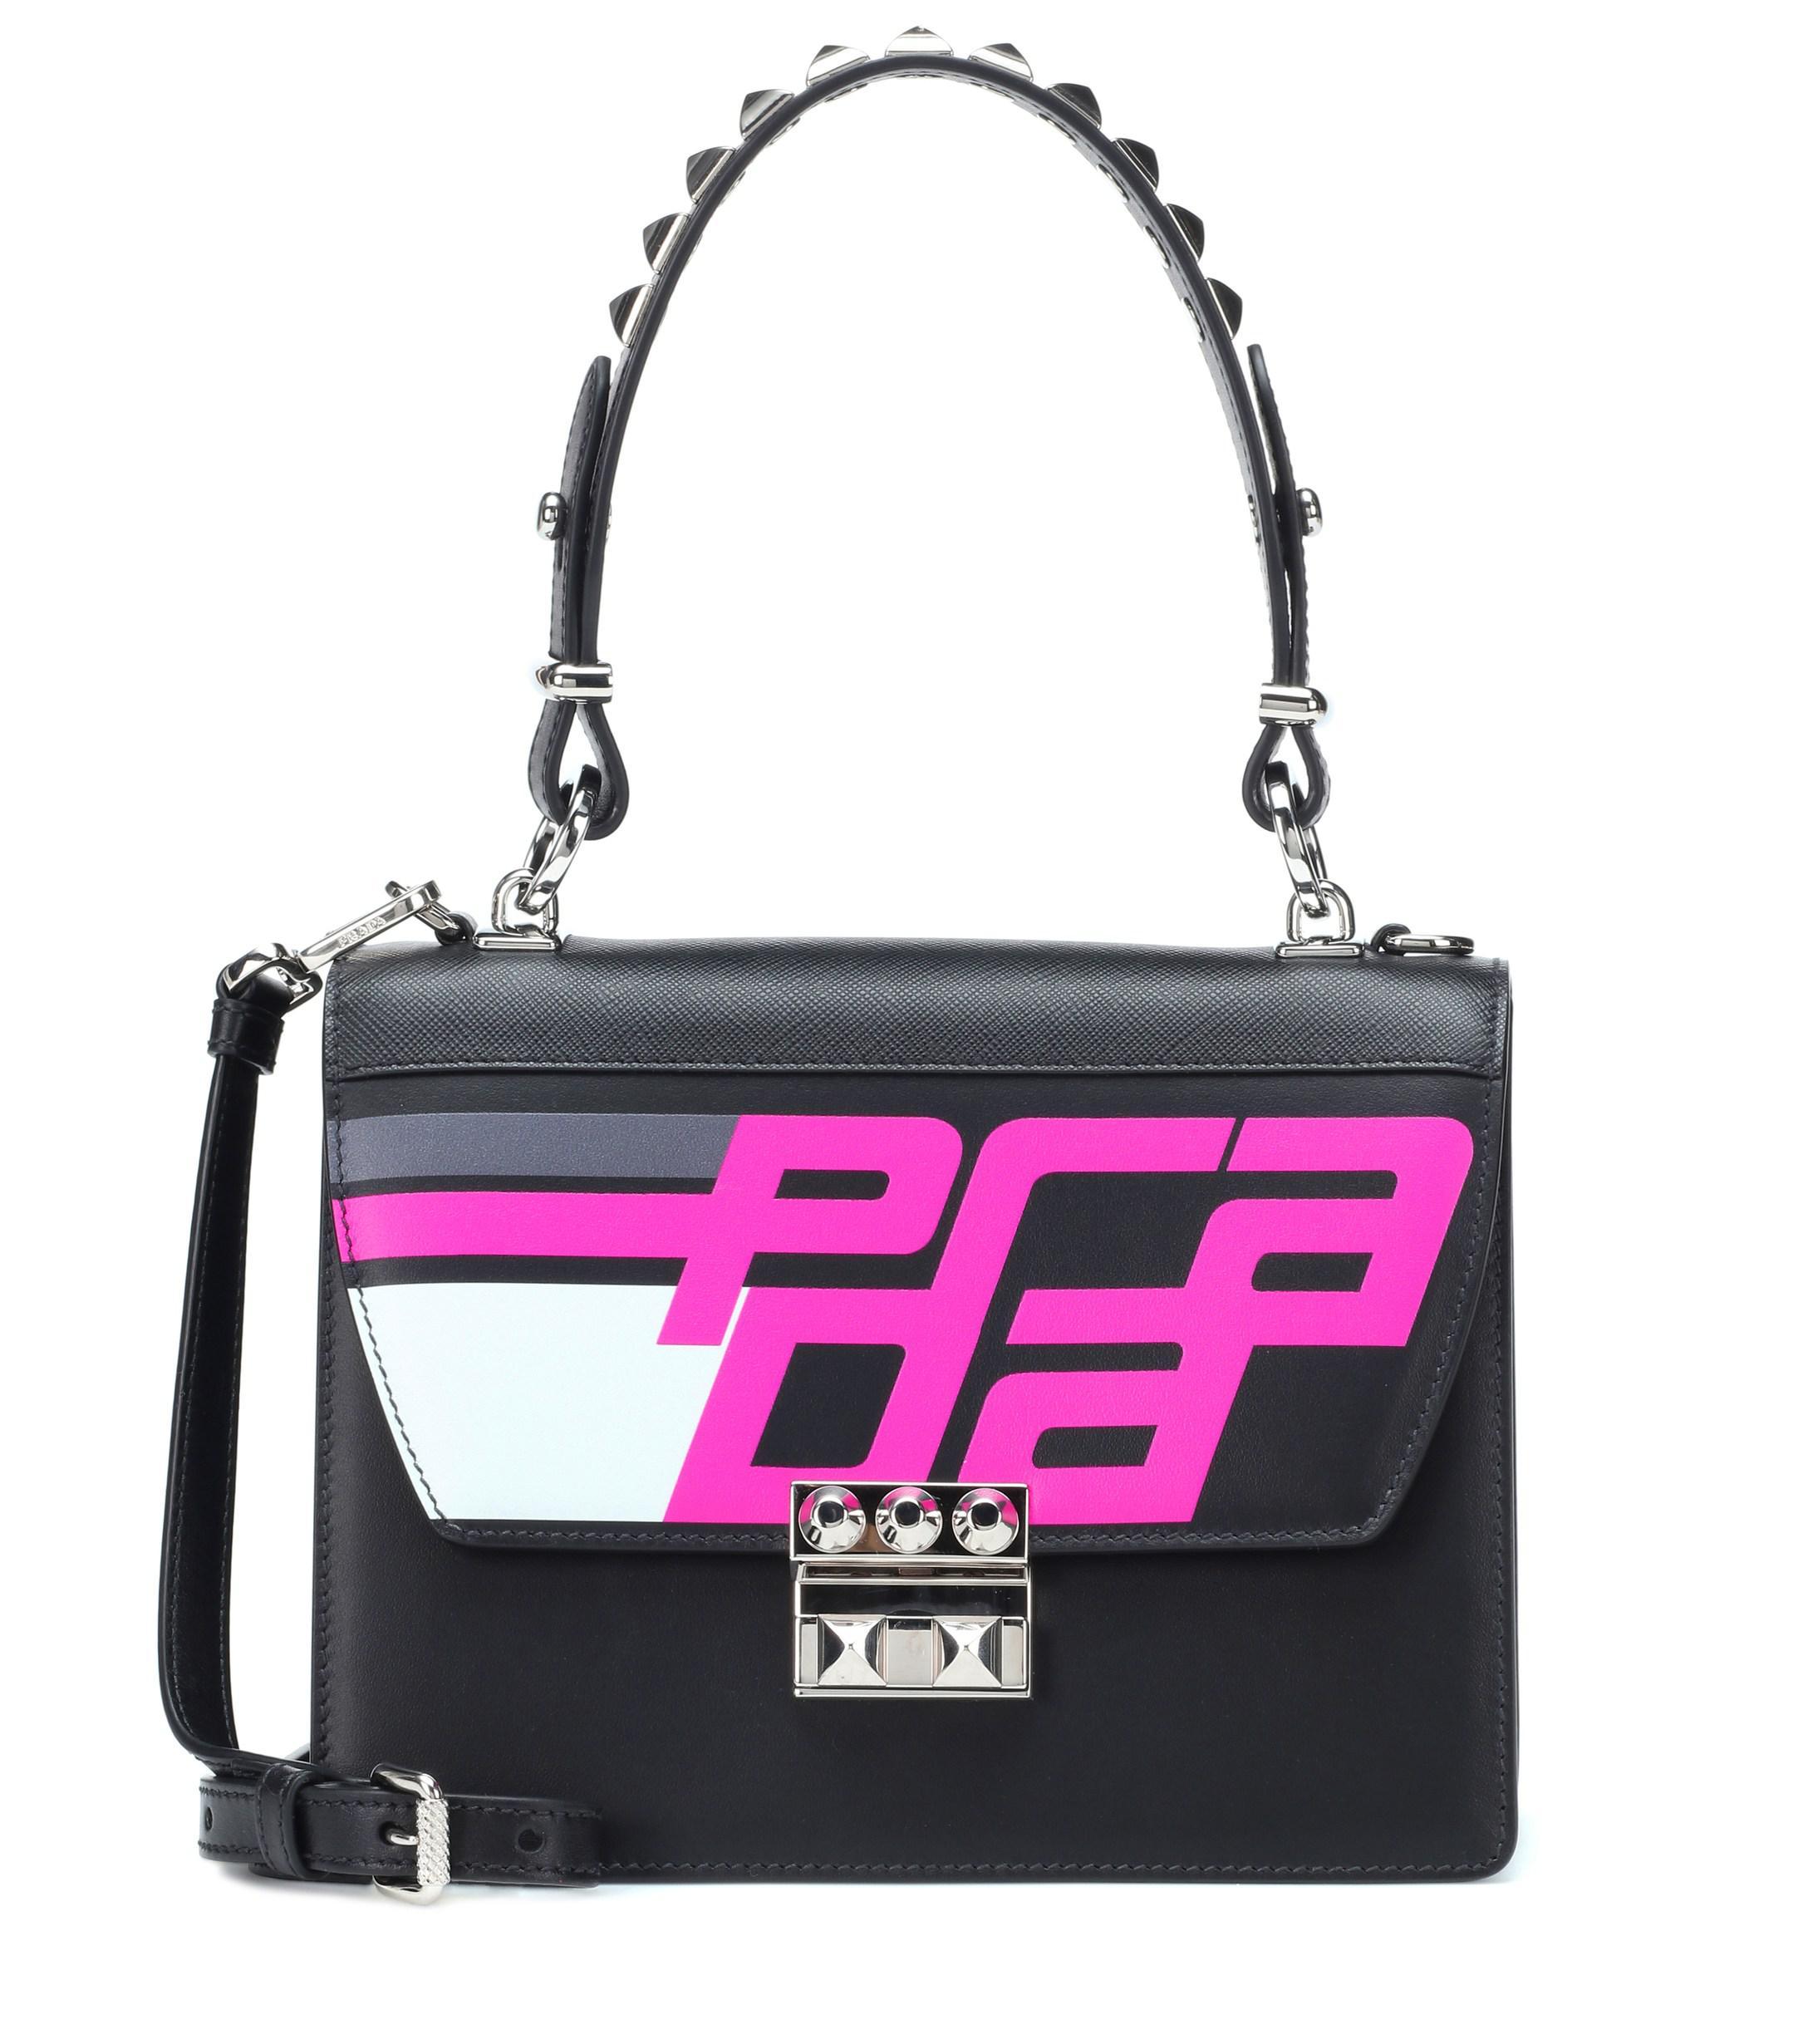 e11c236e518 Lyst - Prada Elektra Leather Shoulder Bag in Black